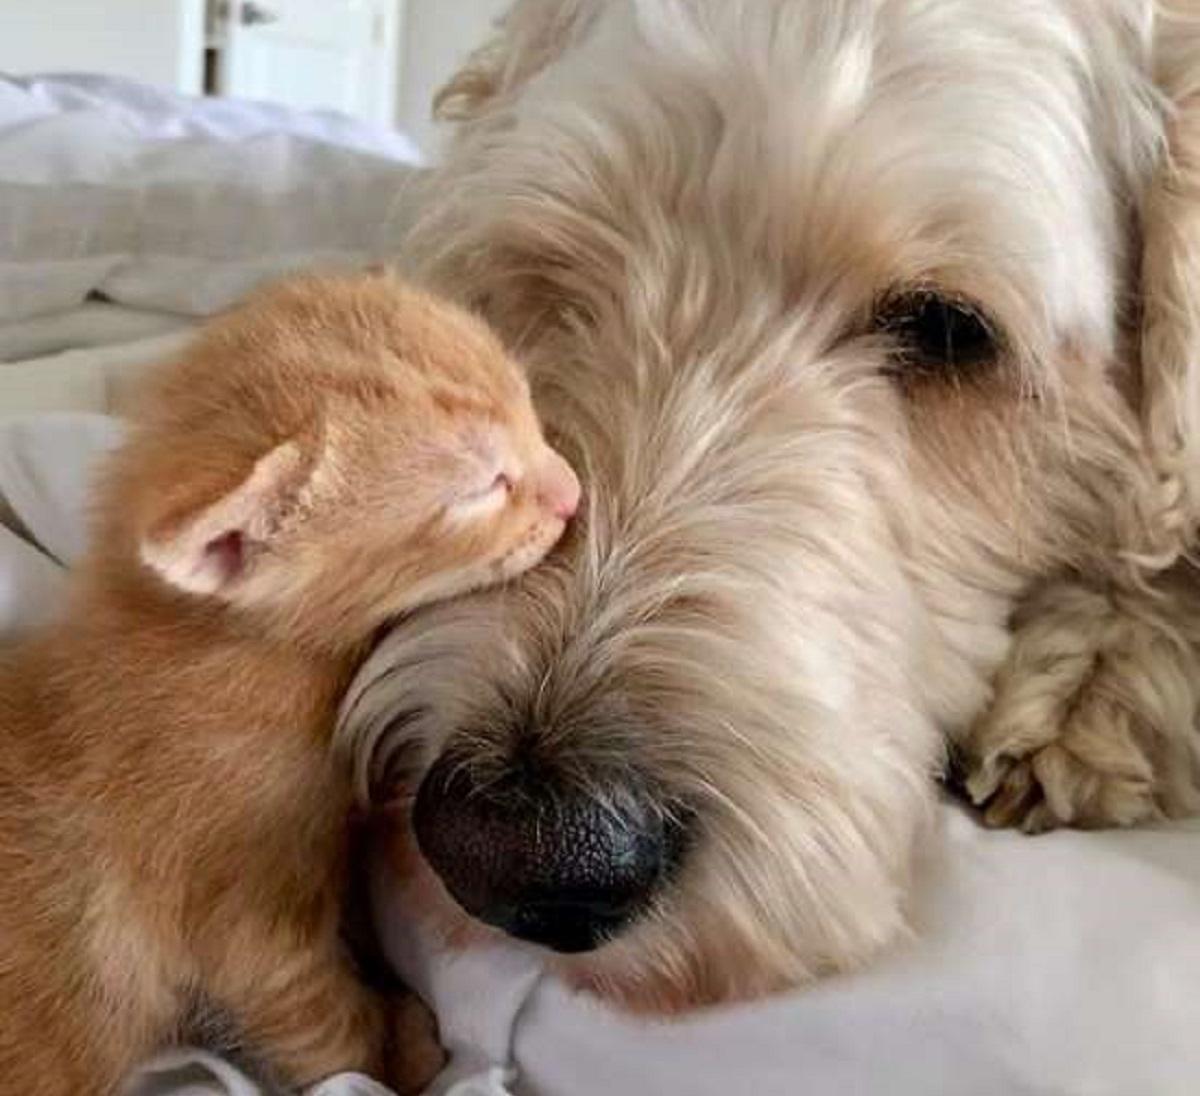 kevin murphy zio dei gattini